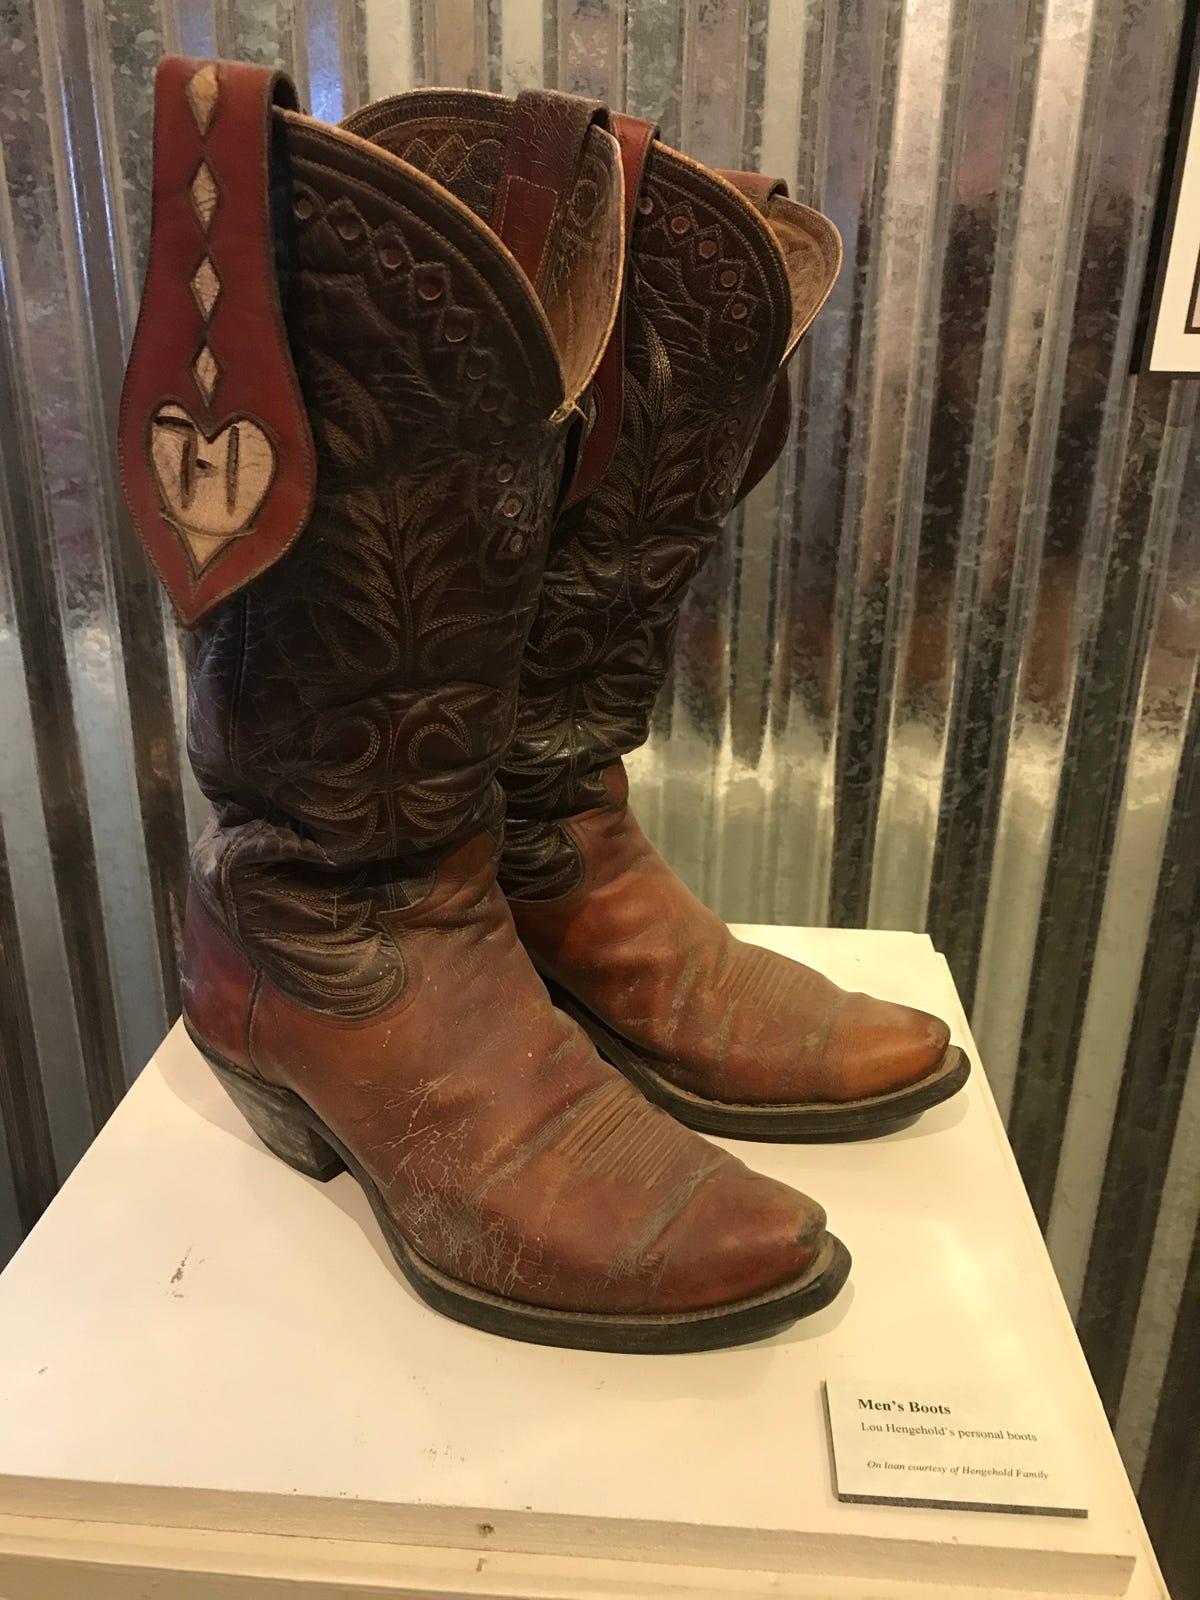 e55122c58d8 Vaquero exhibit in Santa Paula lassos in fans of the Old West